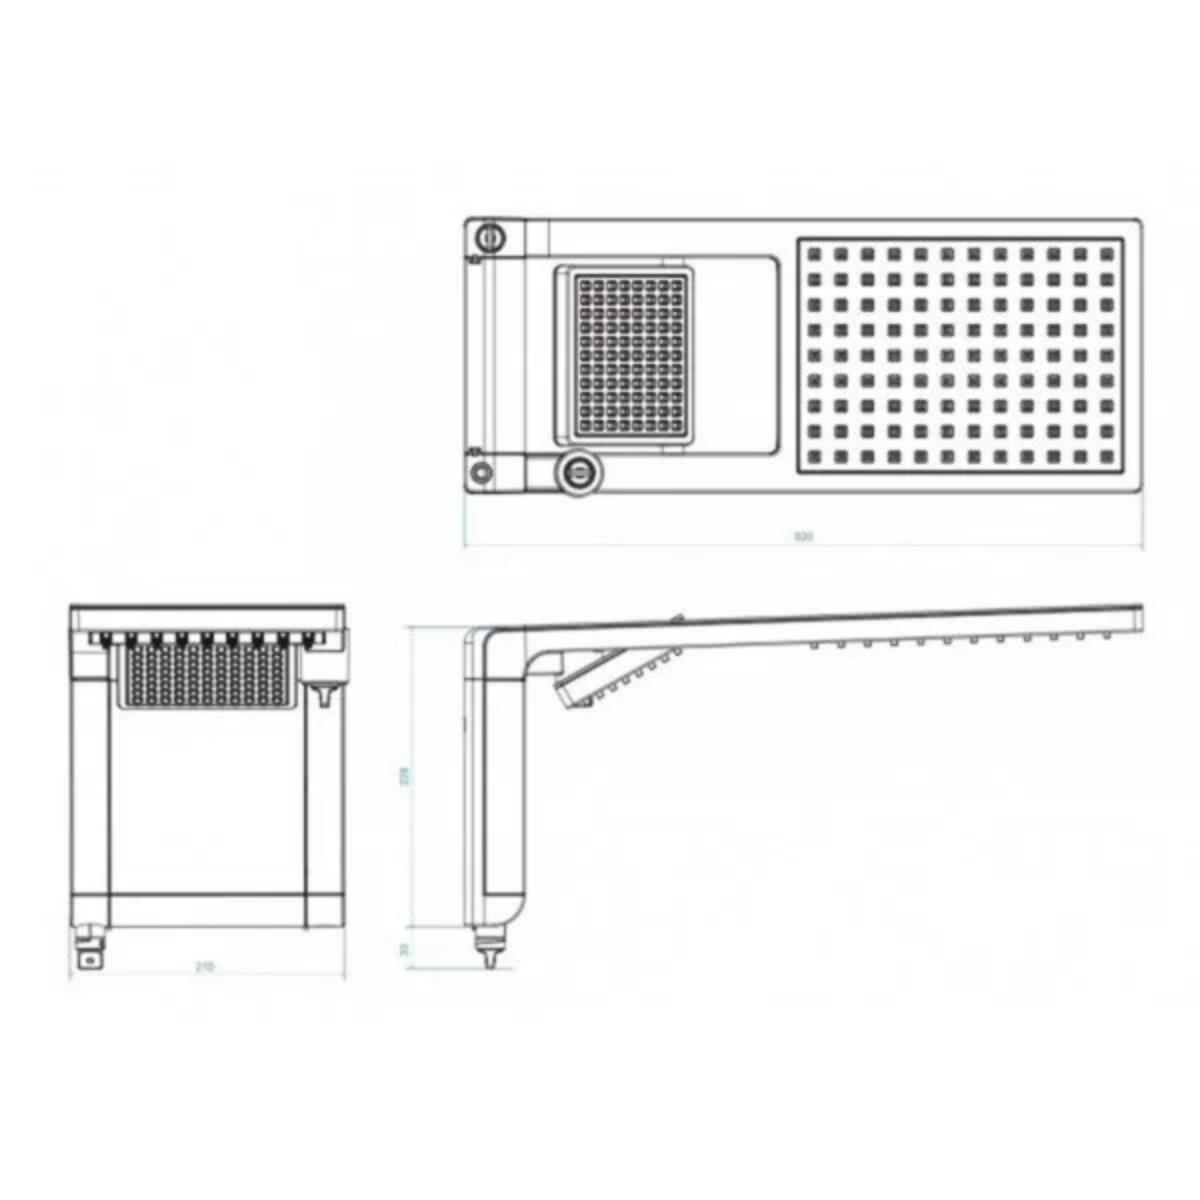 Chuveiro Lorenzetti Acqua Duo Ultra Eletrônico Branco